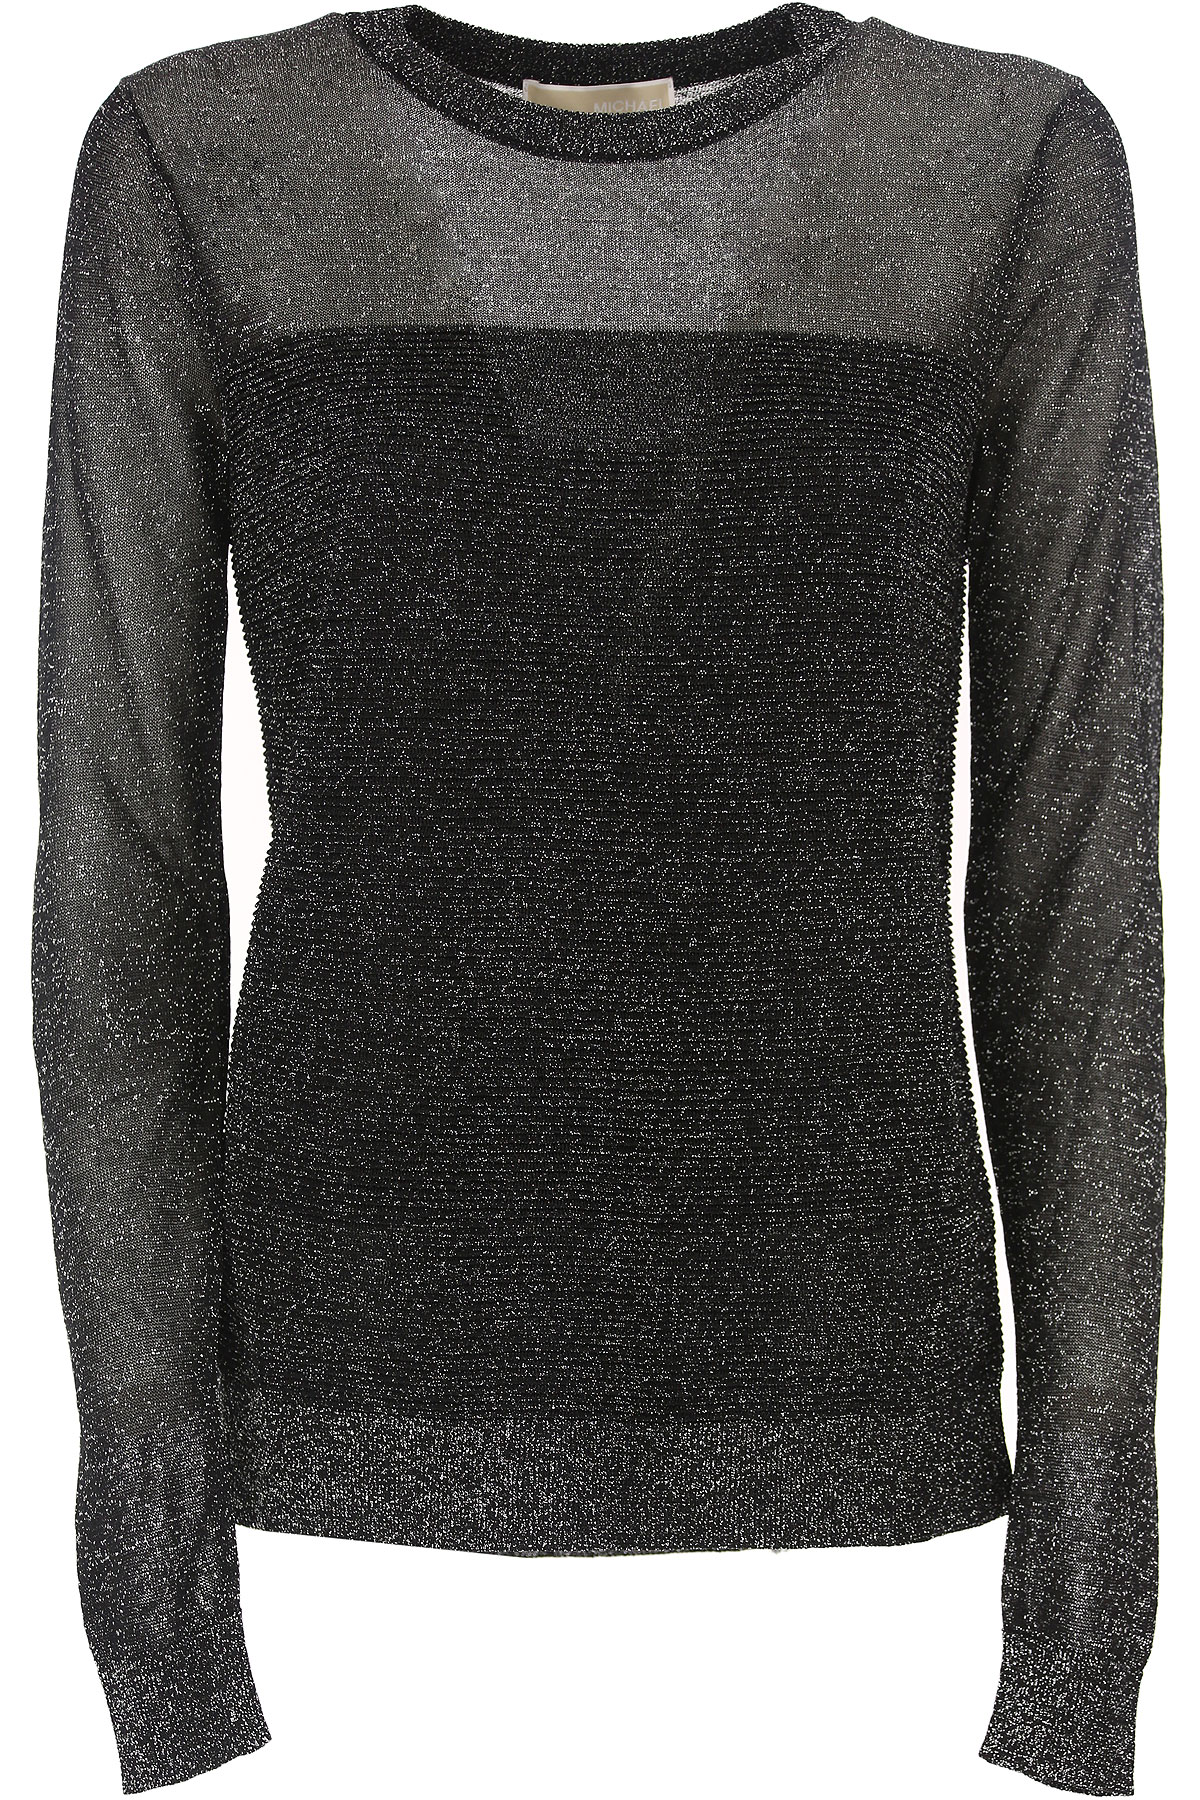 Michael Kors Sweater for Women Jumper On Sale, Black, Rayon, 2019, 10 14